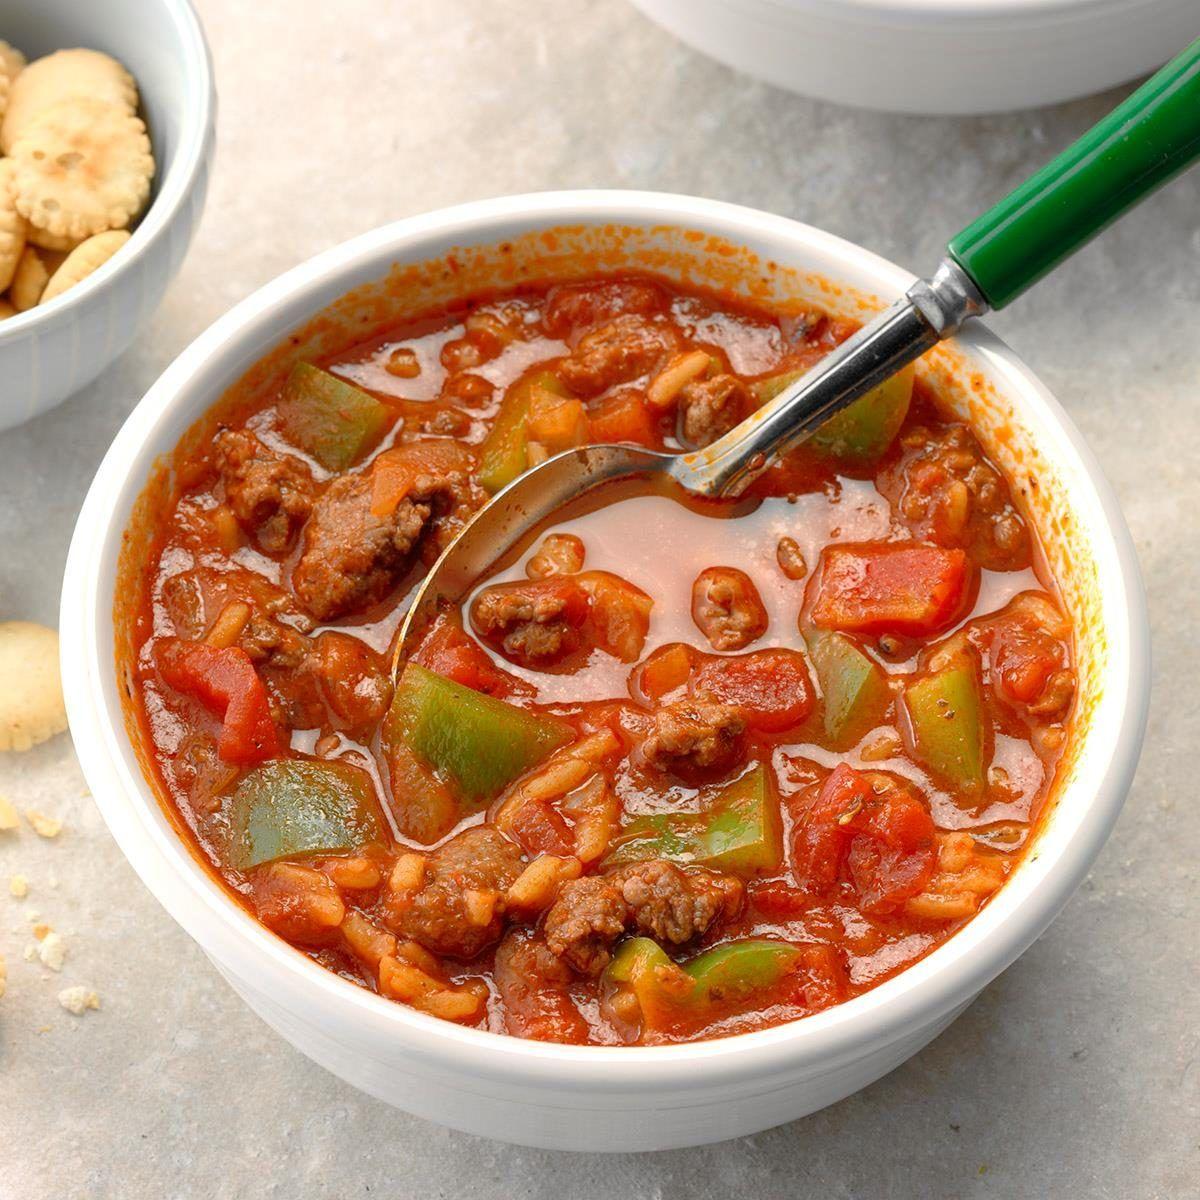 Contest Winning Stuffed Pepper Soup Recipe In 2020 Stuffed Pepper Soup Stuffed Peppers Soup Recipes